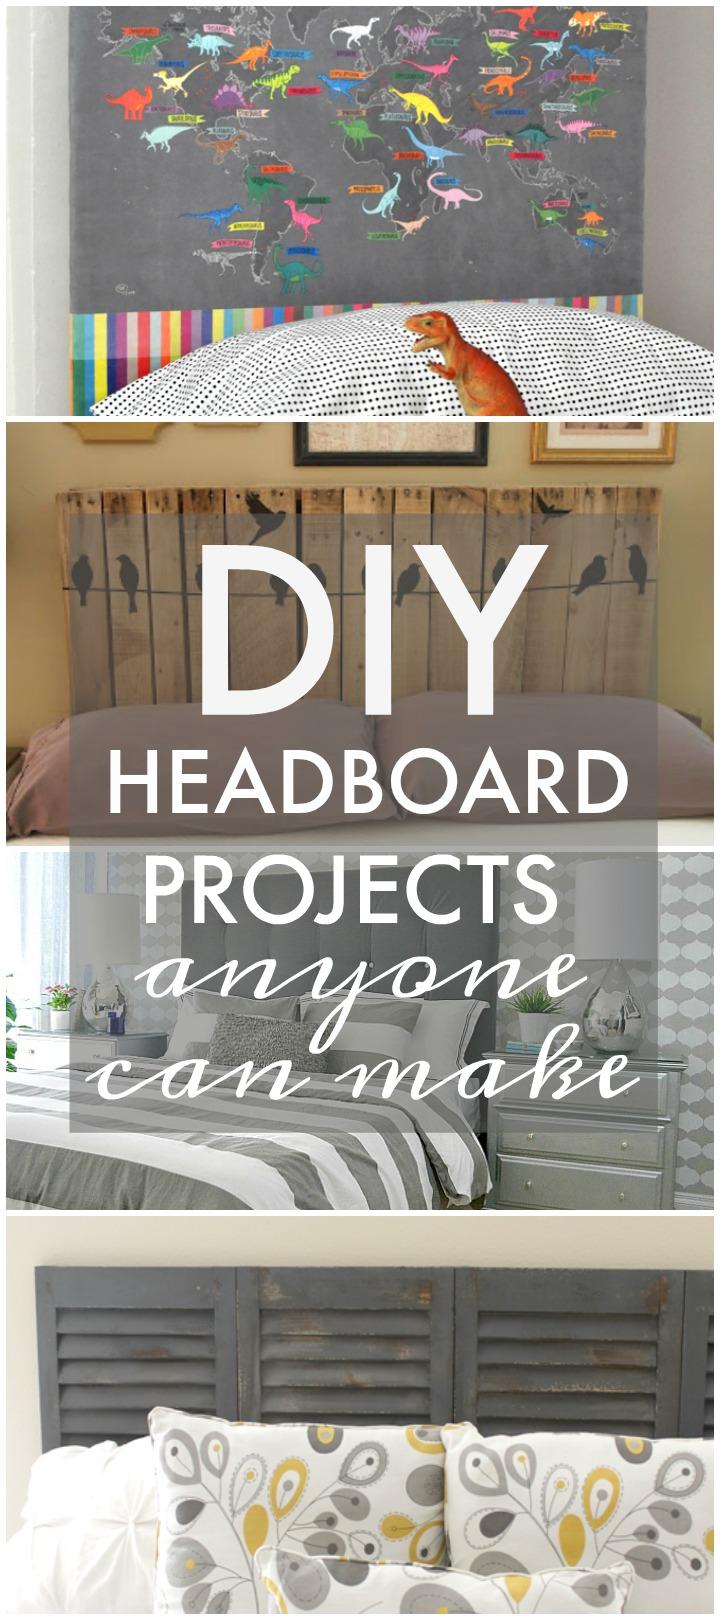 DIY Headboard Projects